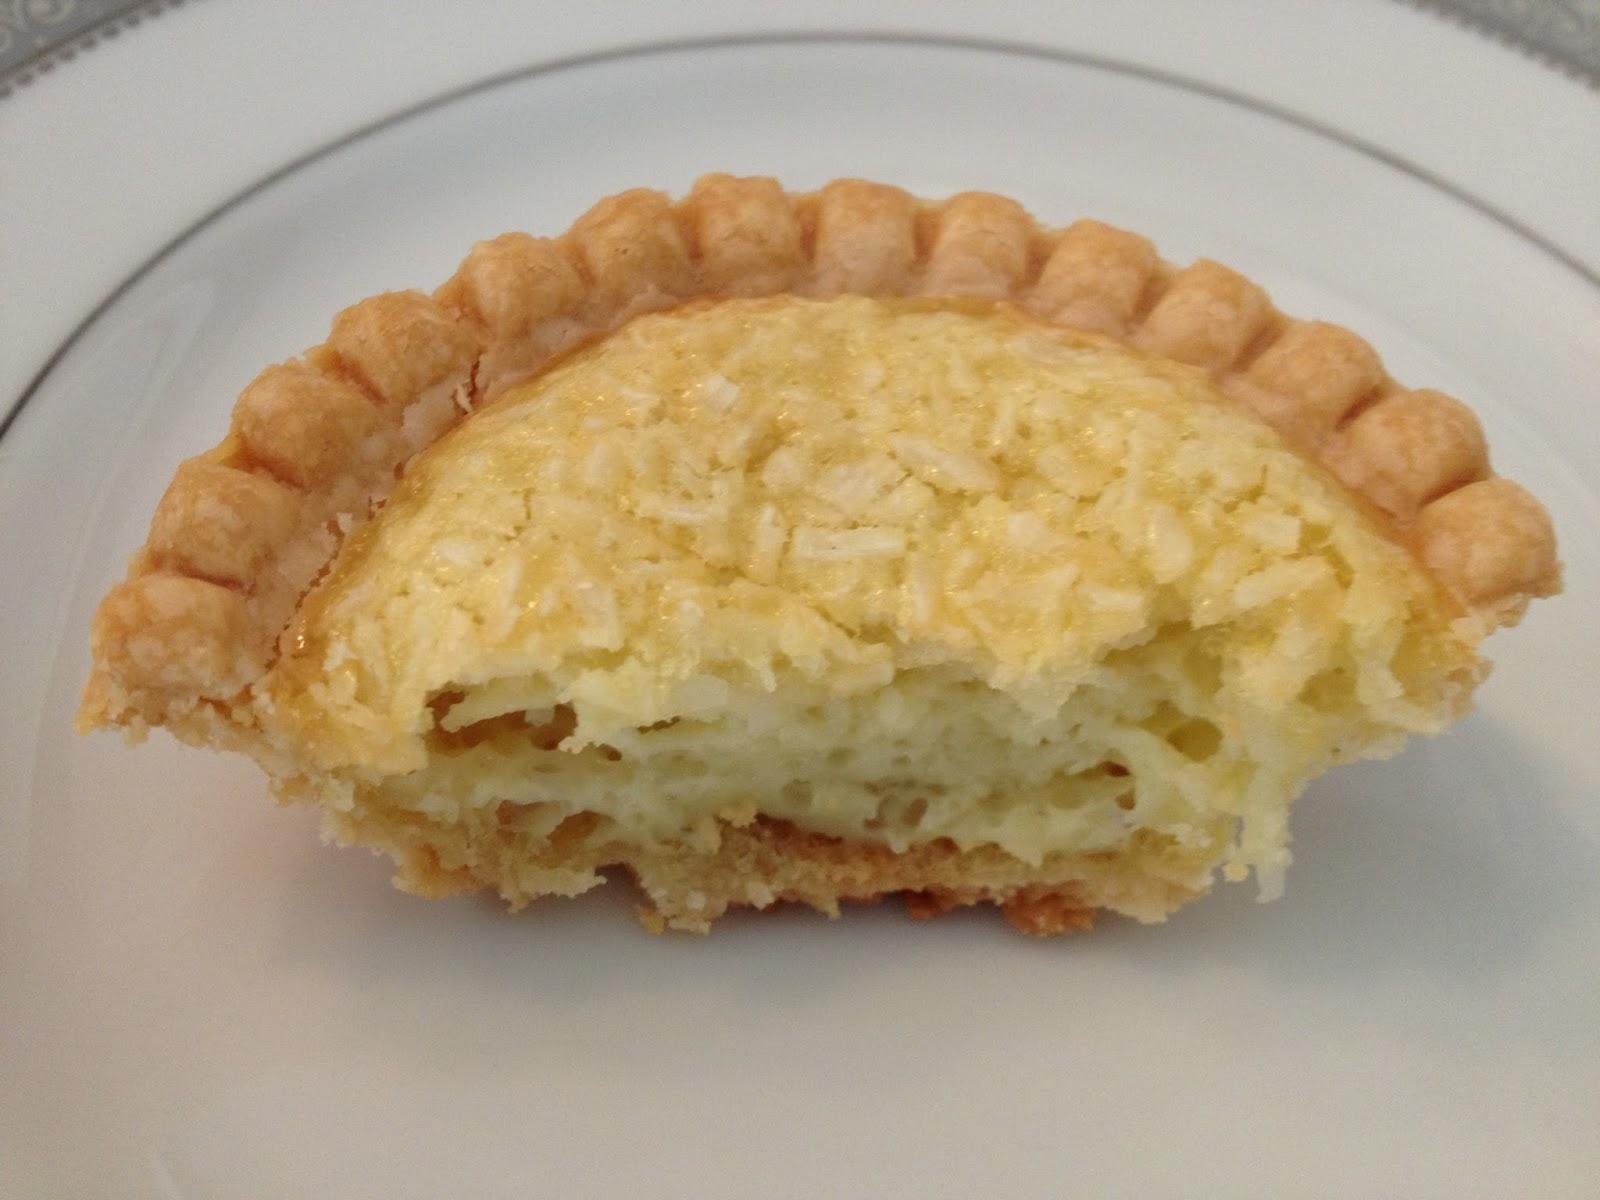 akashiga's Cooking: Baked Coconut Custard Pie